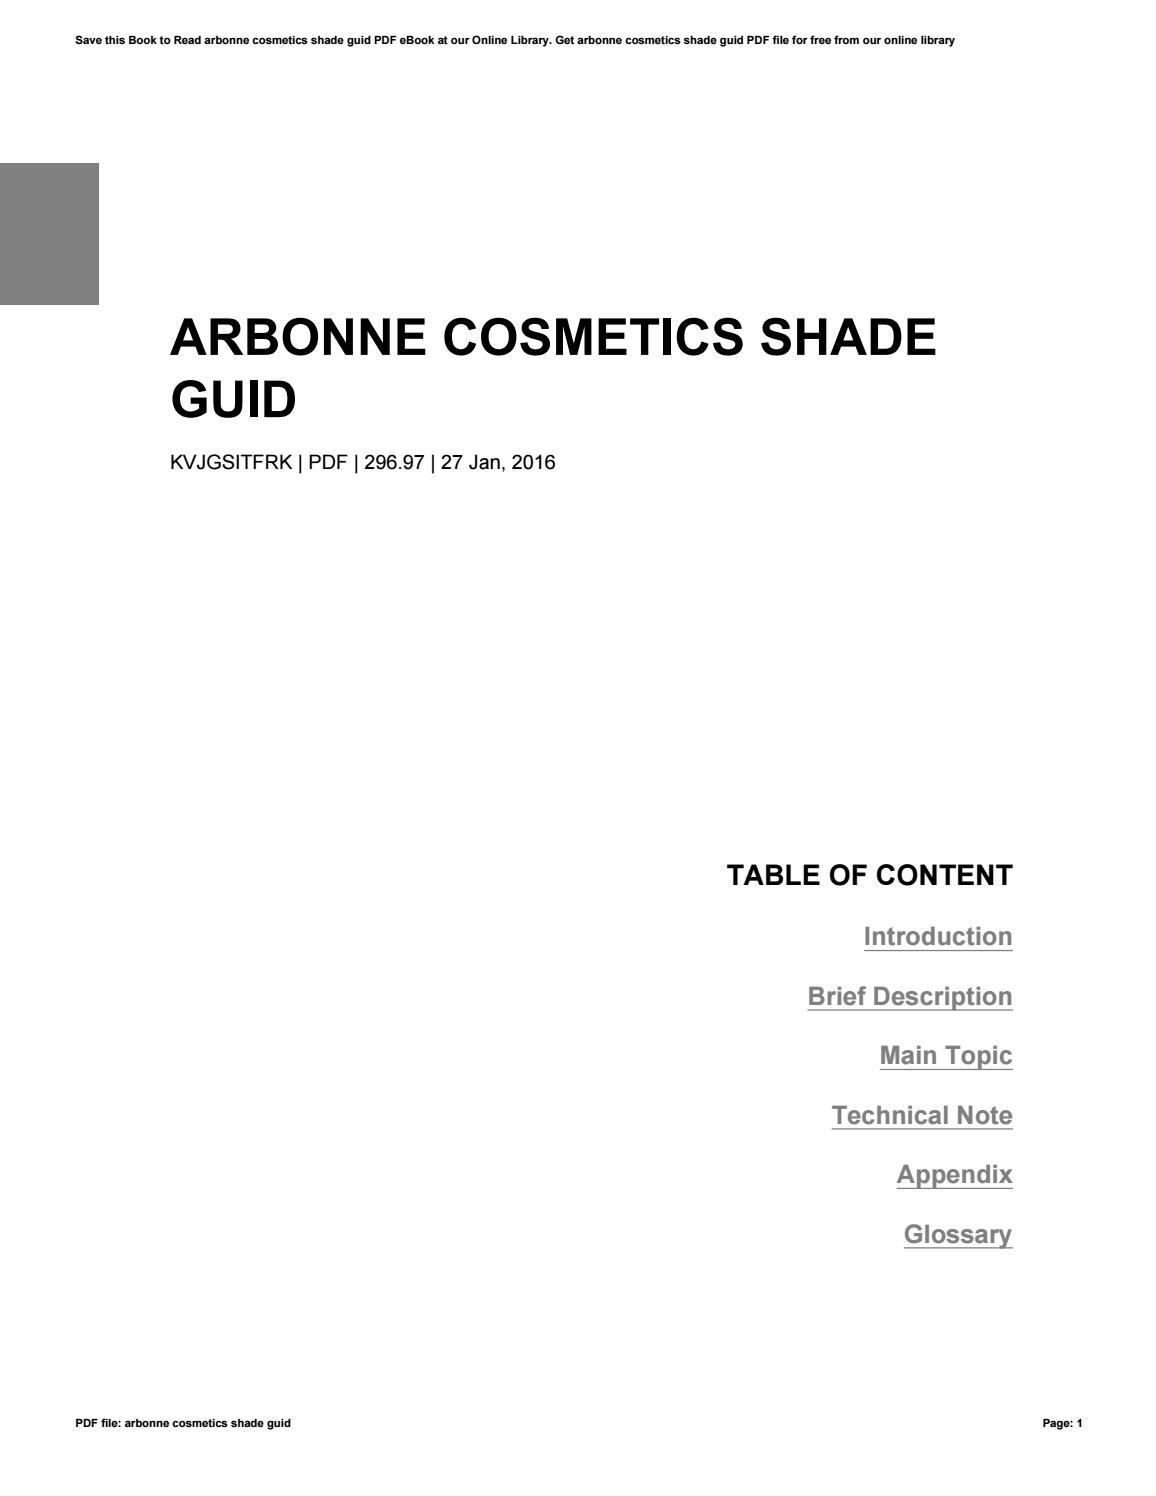 Introduction Of Cosmetics Pdf